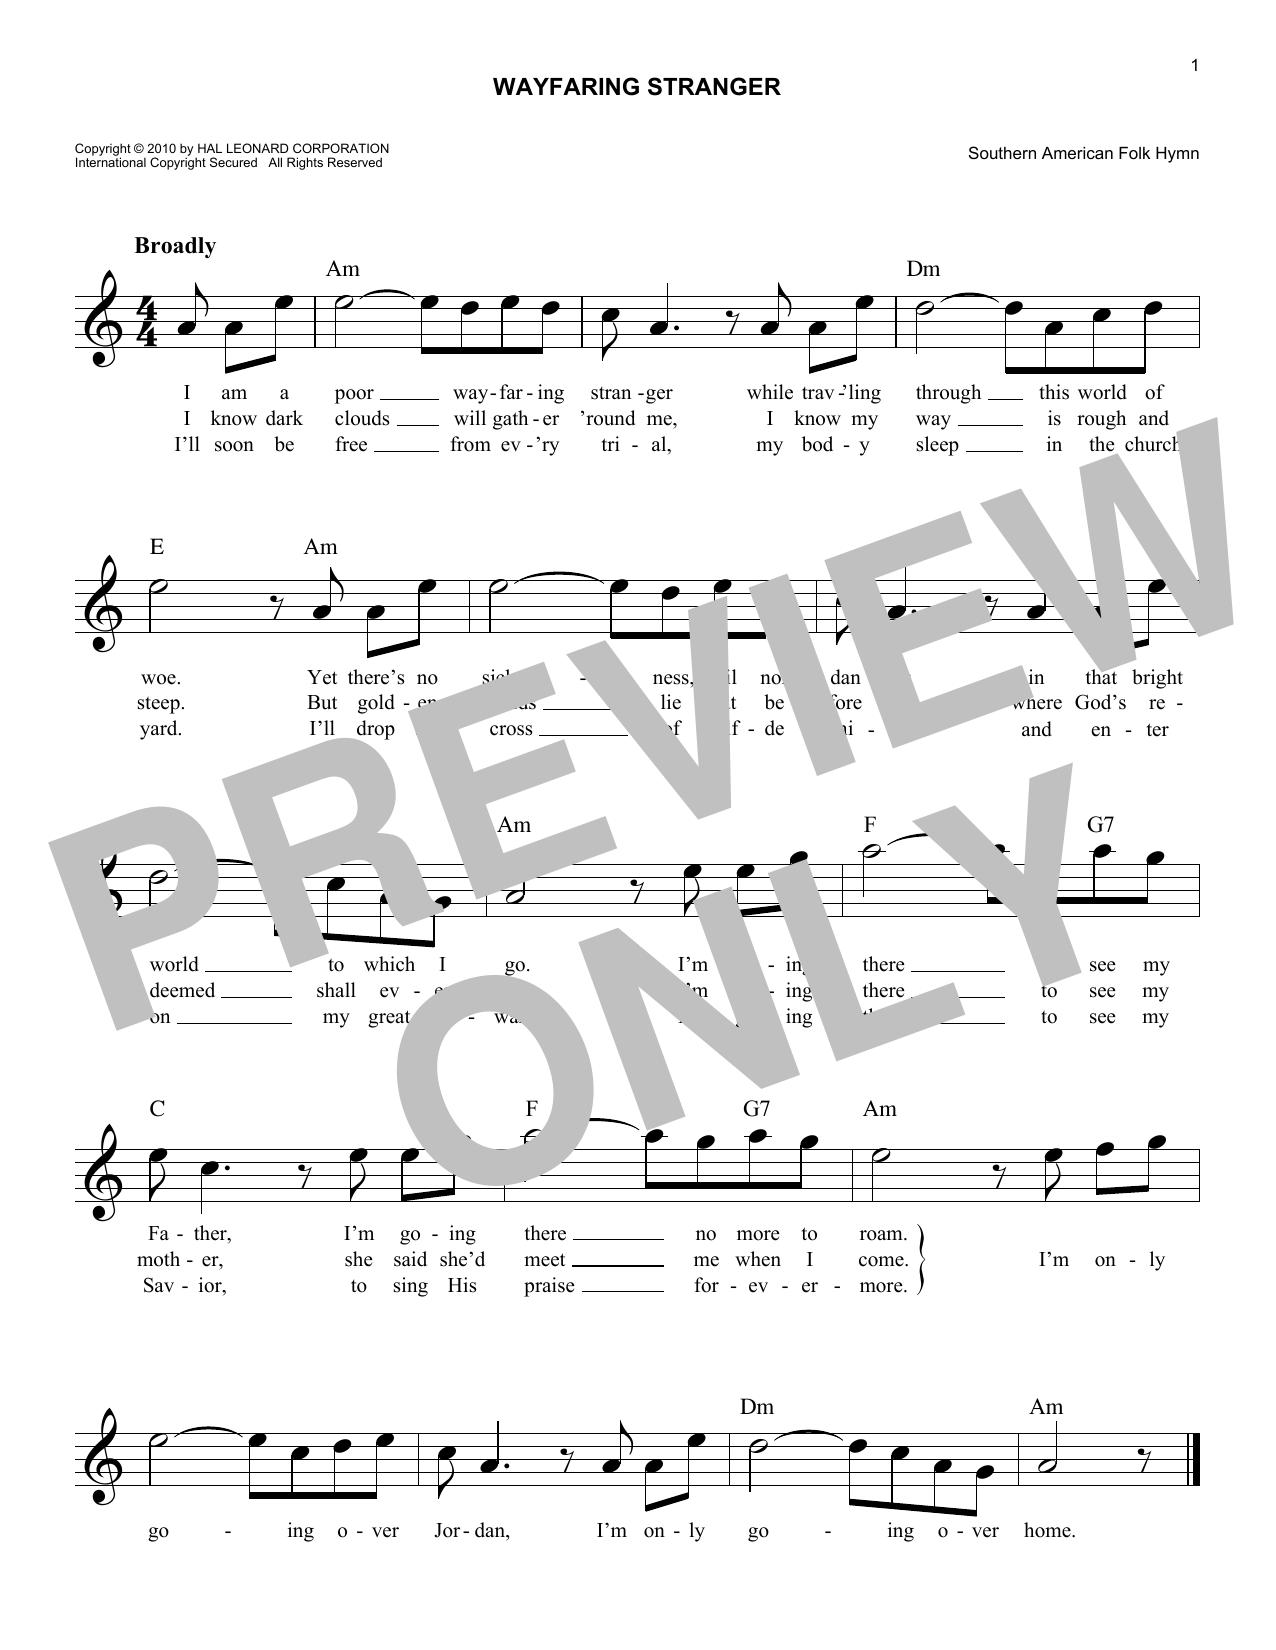 Sheet Music Digital Files To Print Licensed Folk Digital Sheet Music